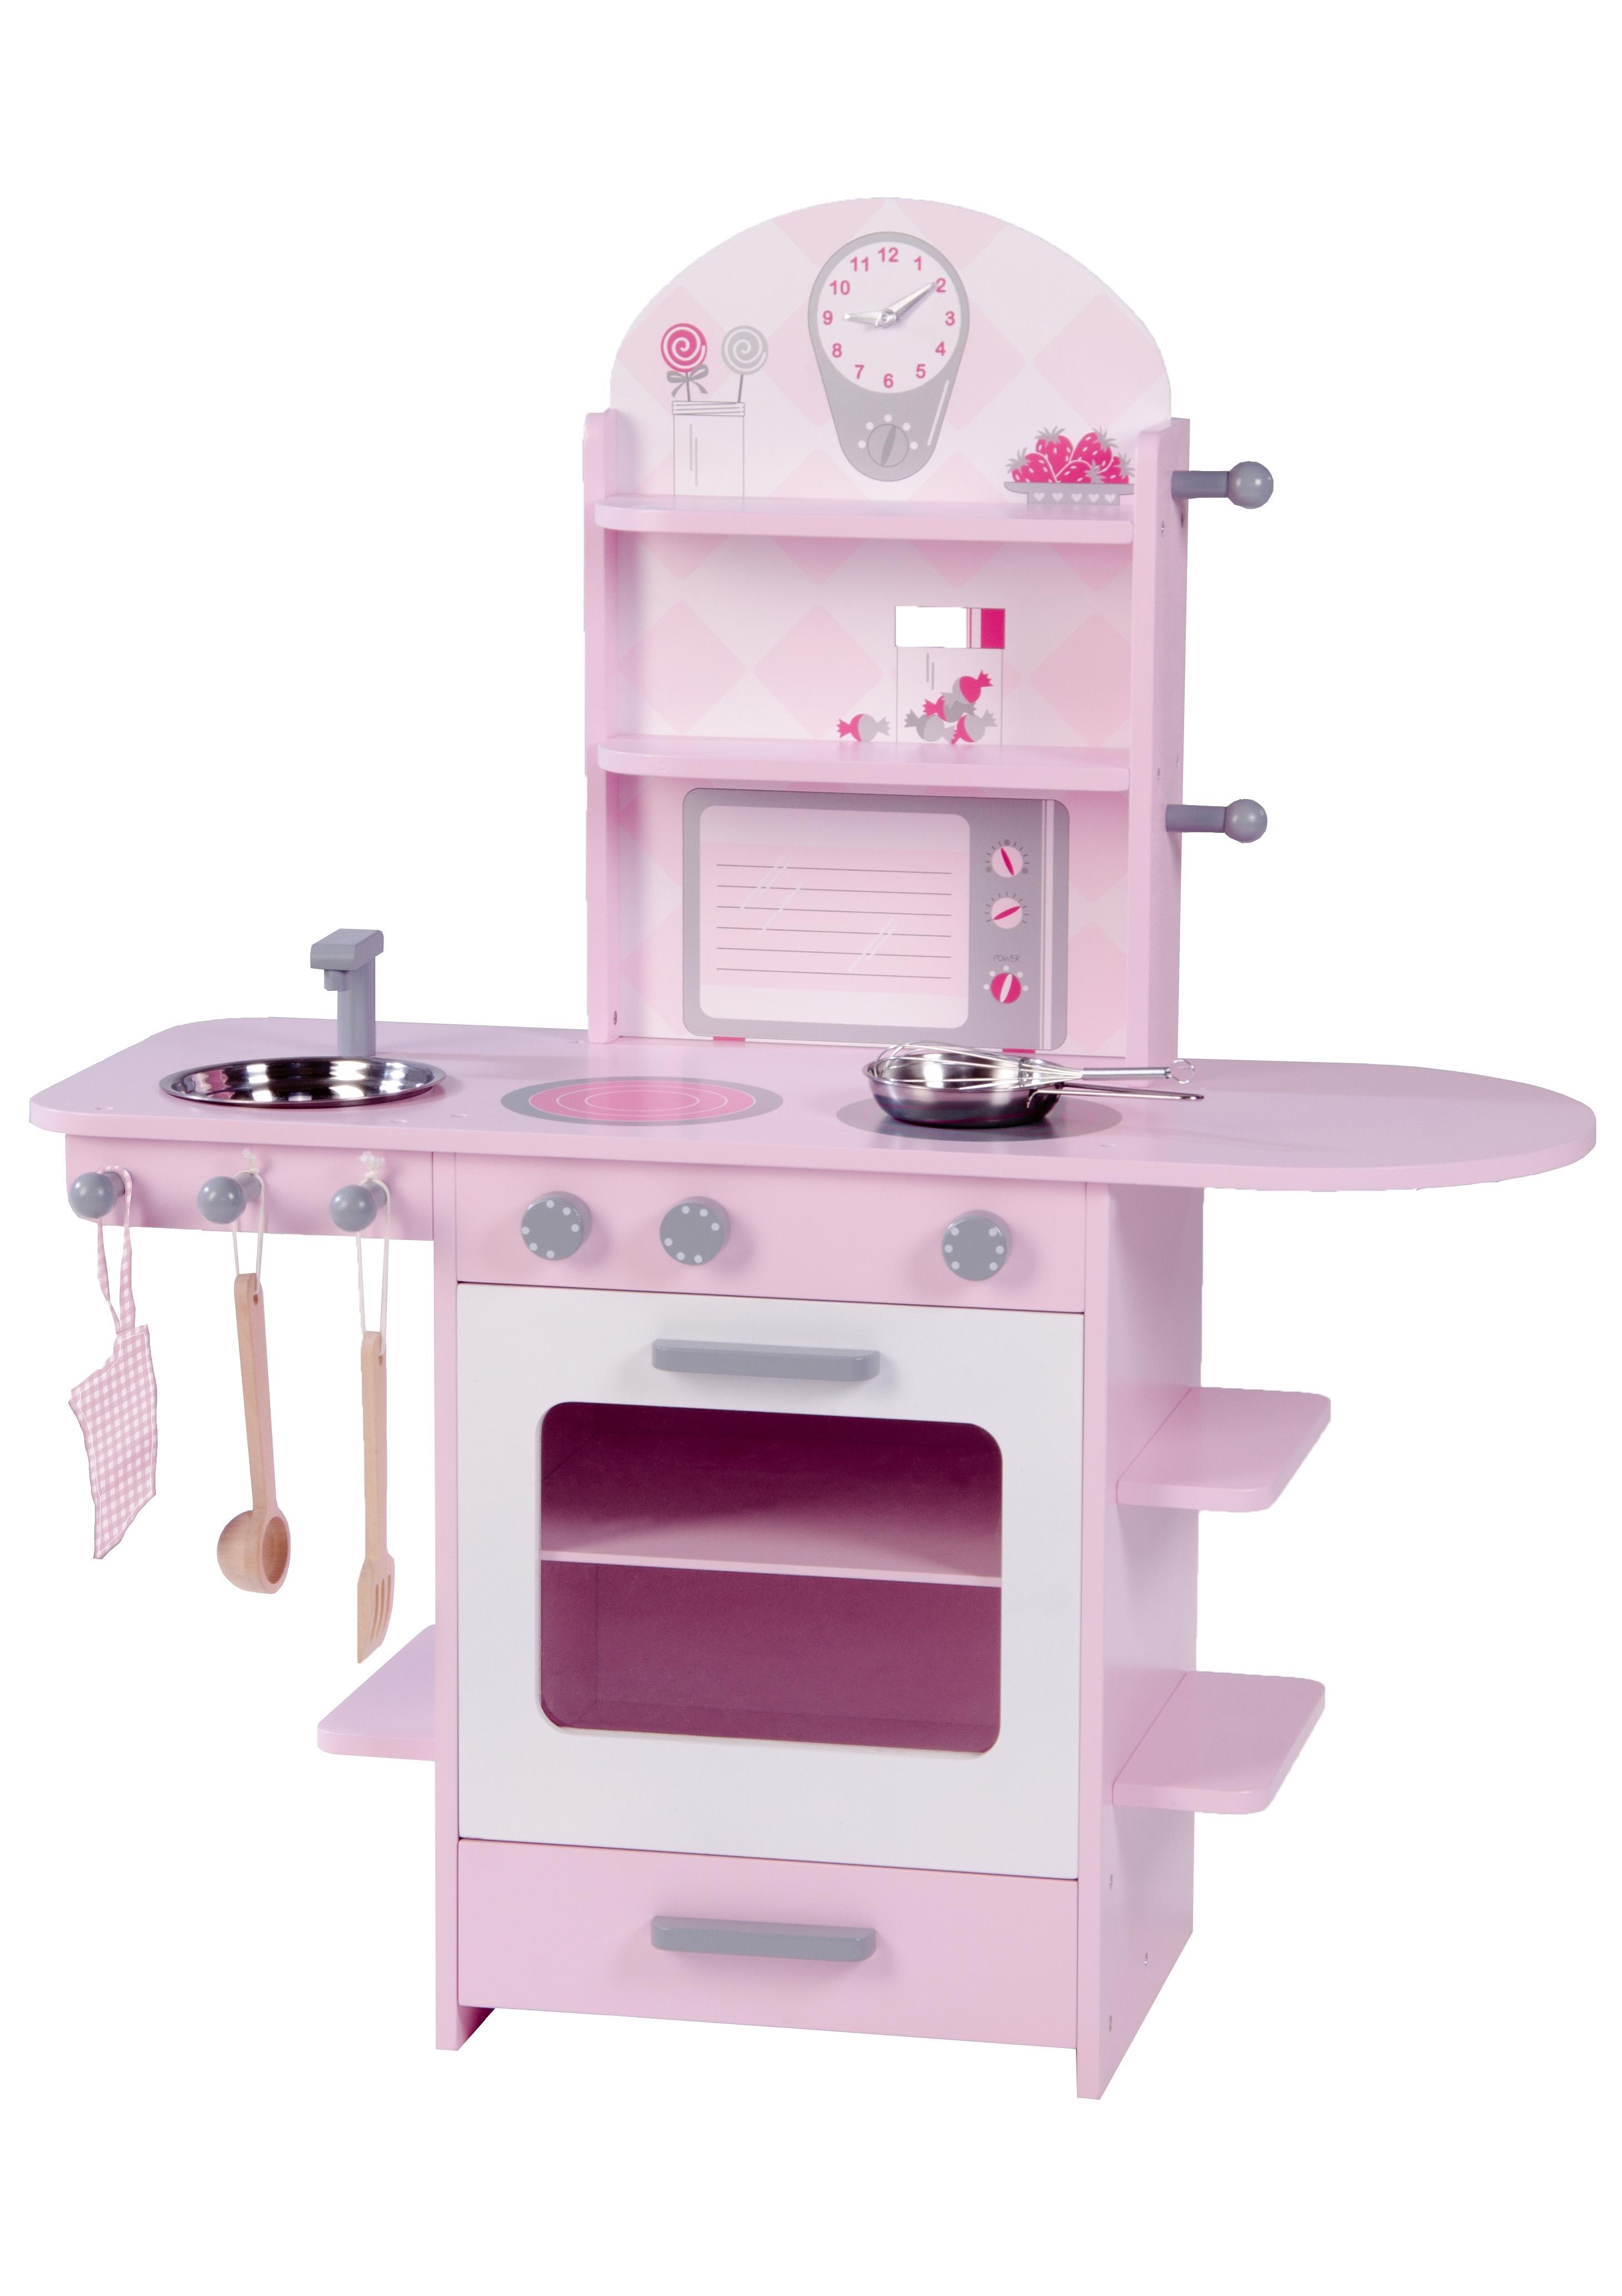 Roba Speelkeukentje Kinderkeuken roze - gratis ruilen op otto.nl